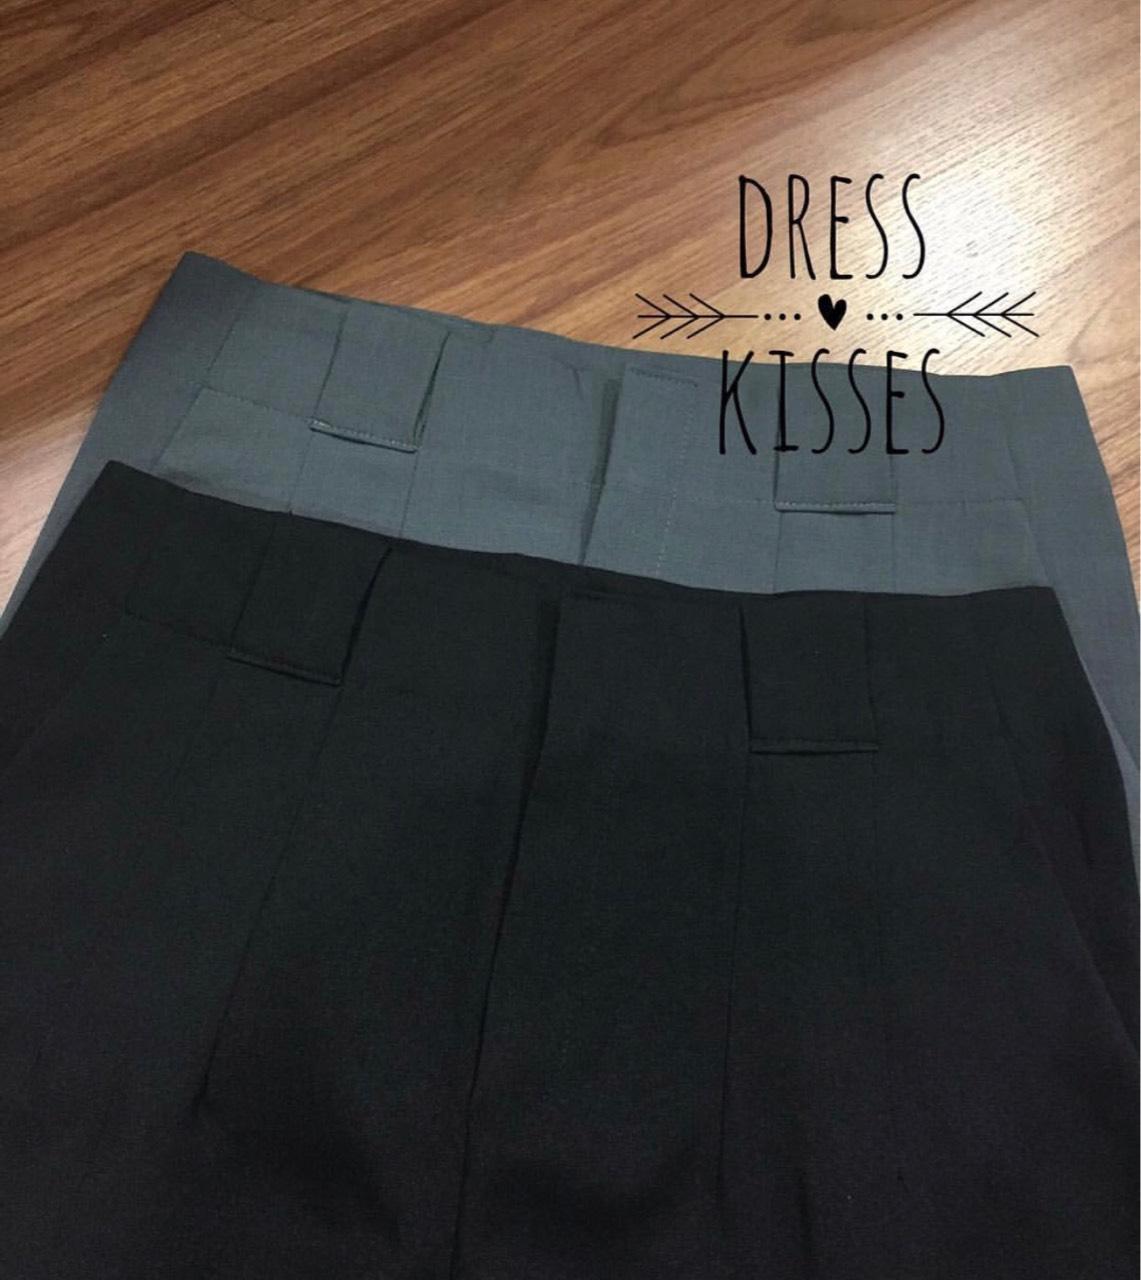 dresskisses